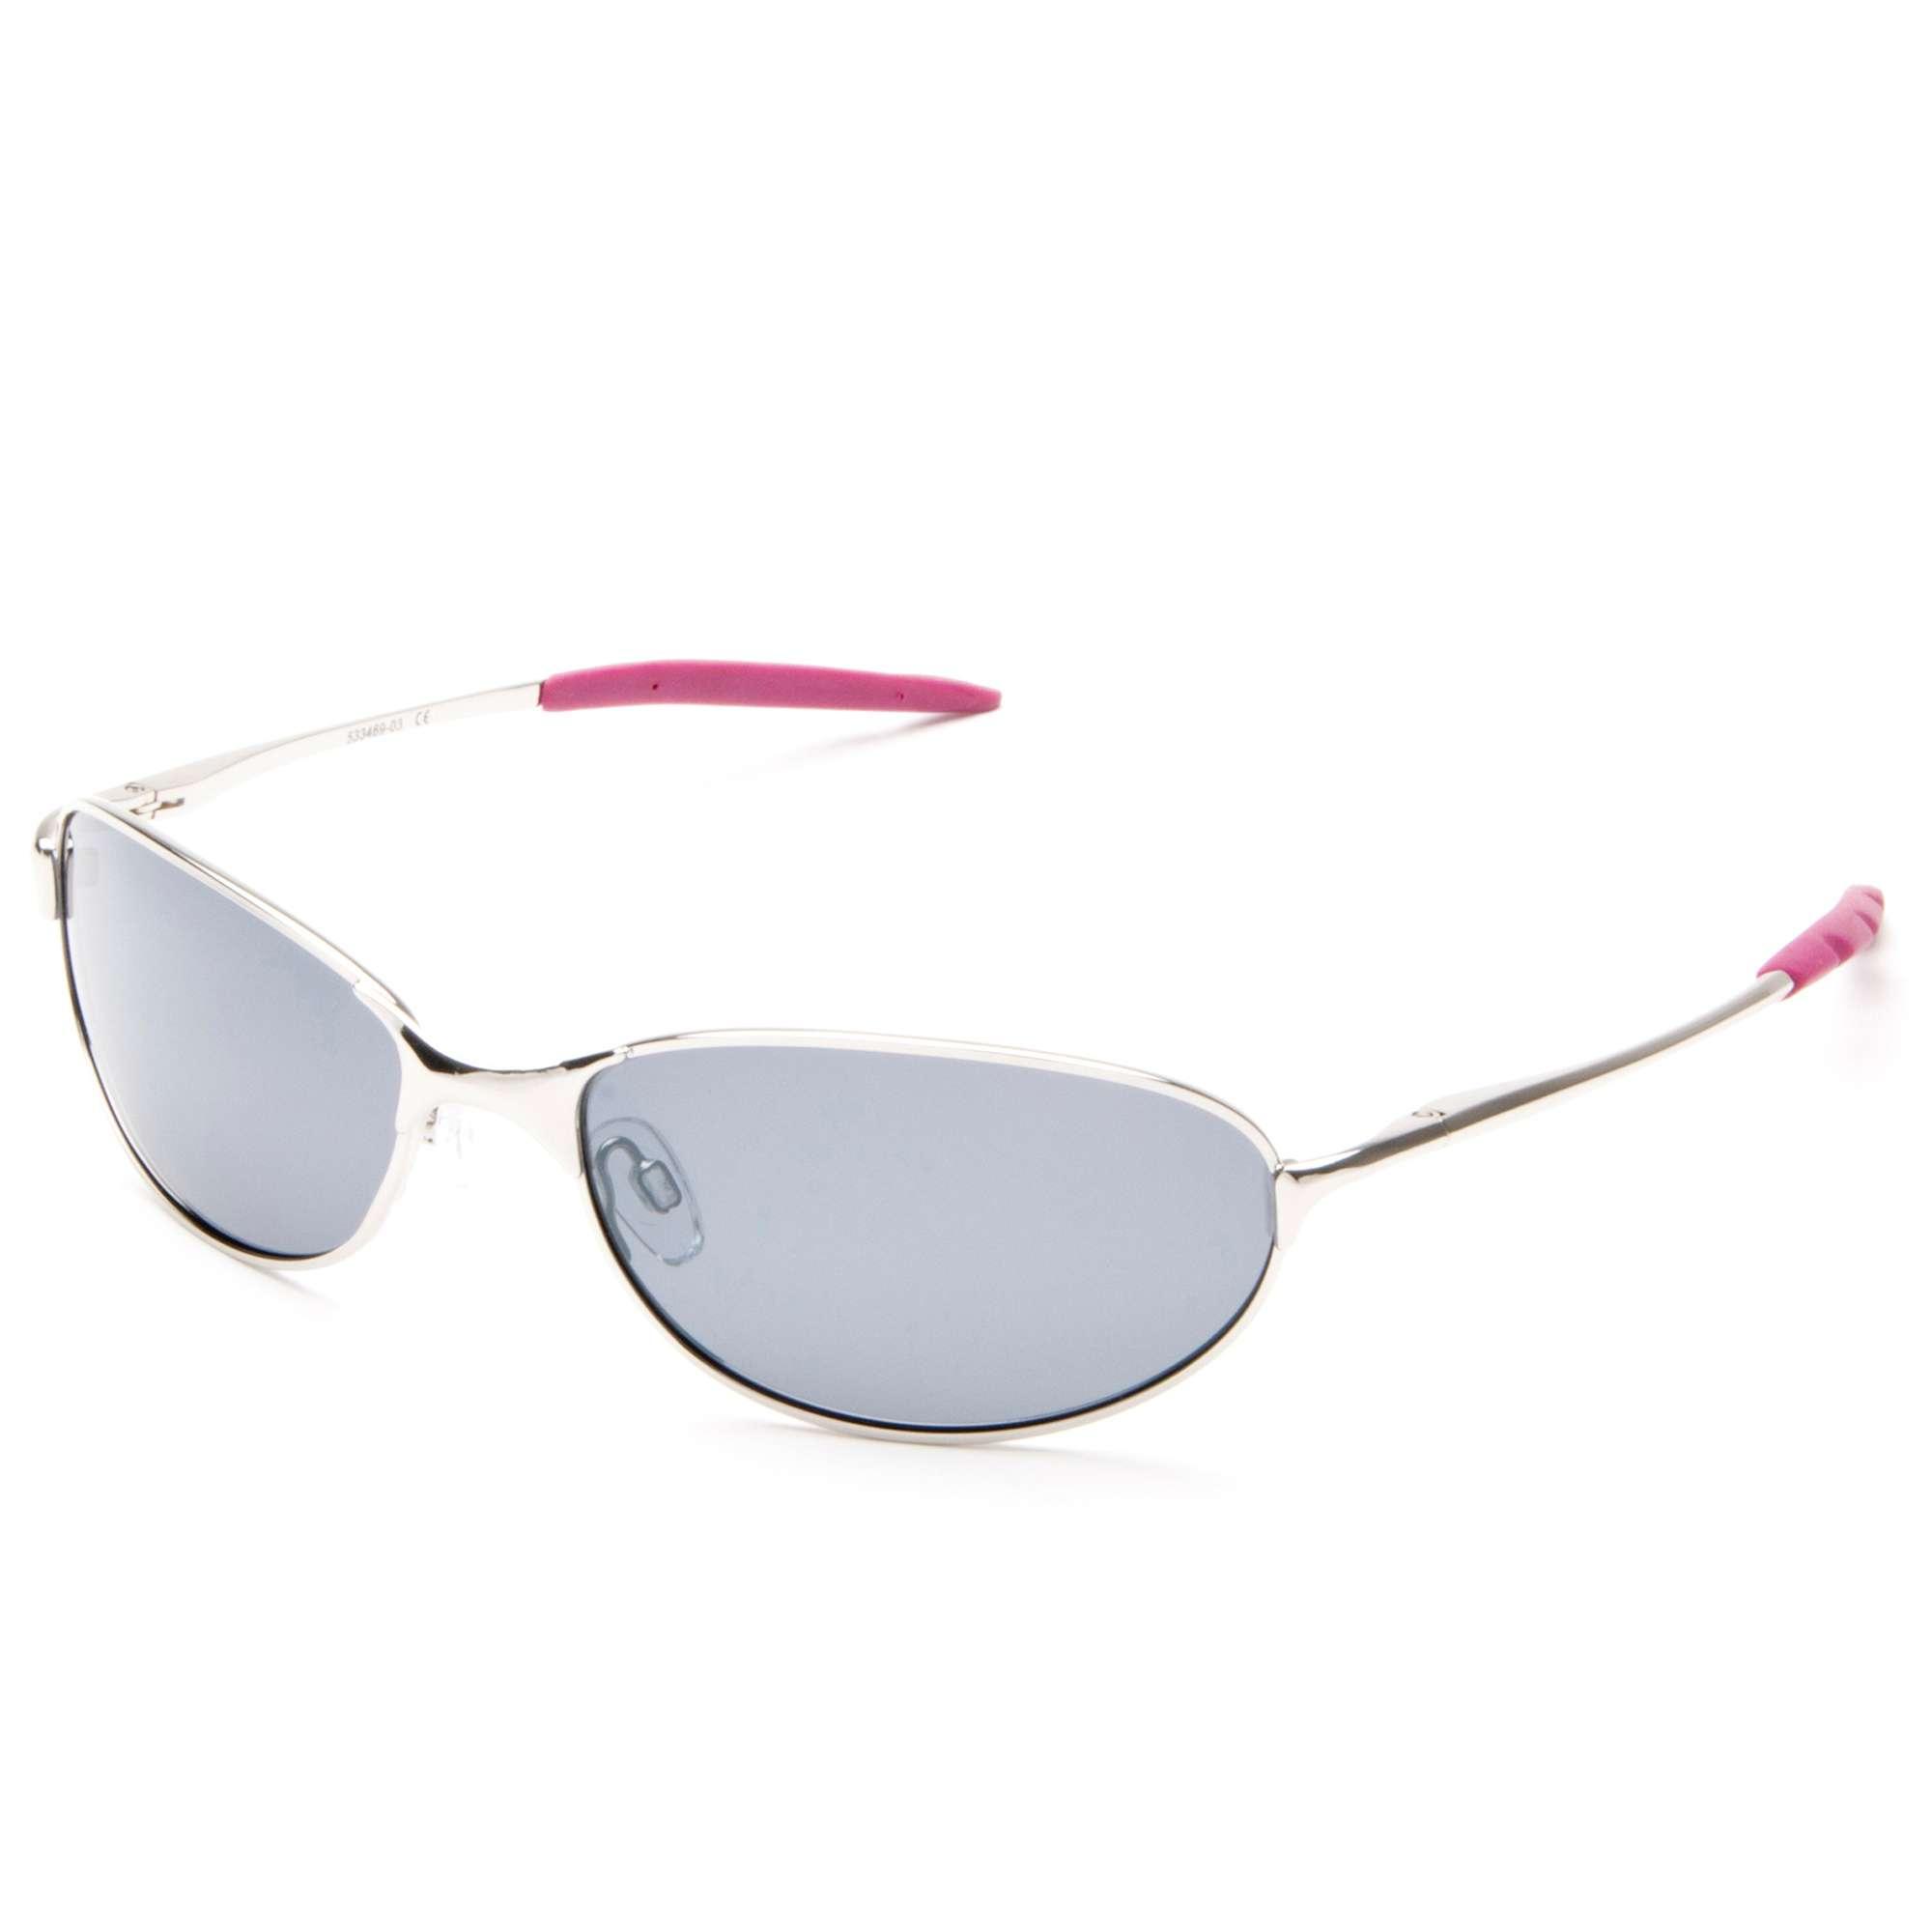 PETER STORM Women's FF Oval Wrap-Around Sunglasses